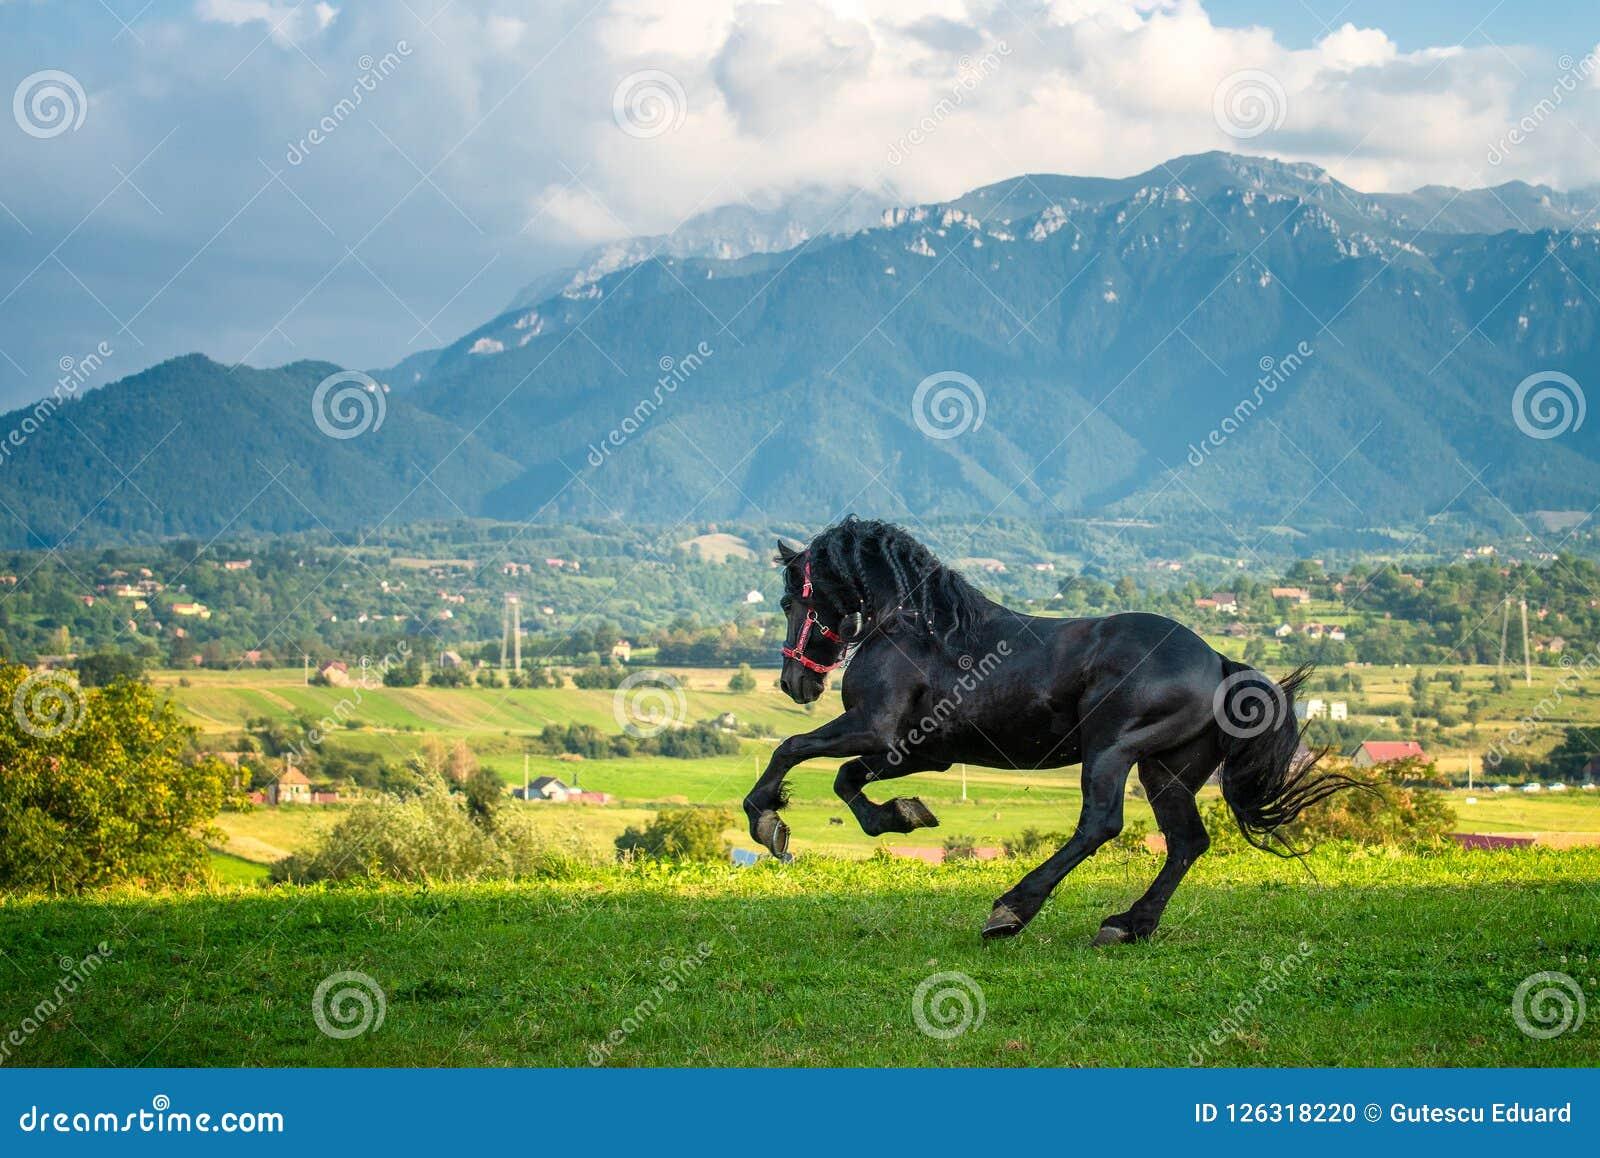 Black friesian horse running at the mountain farm in Romania, black beautiful horse